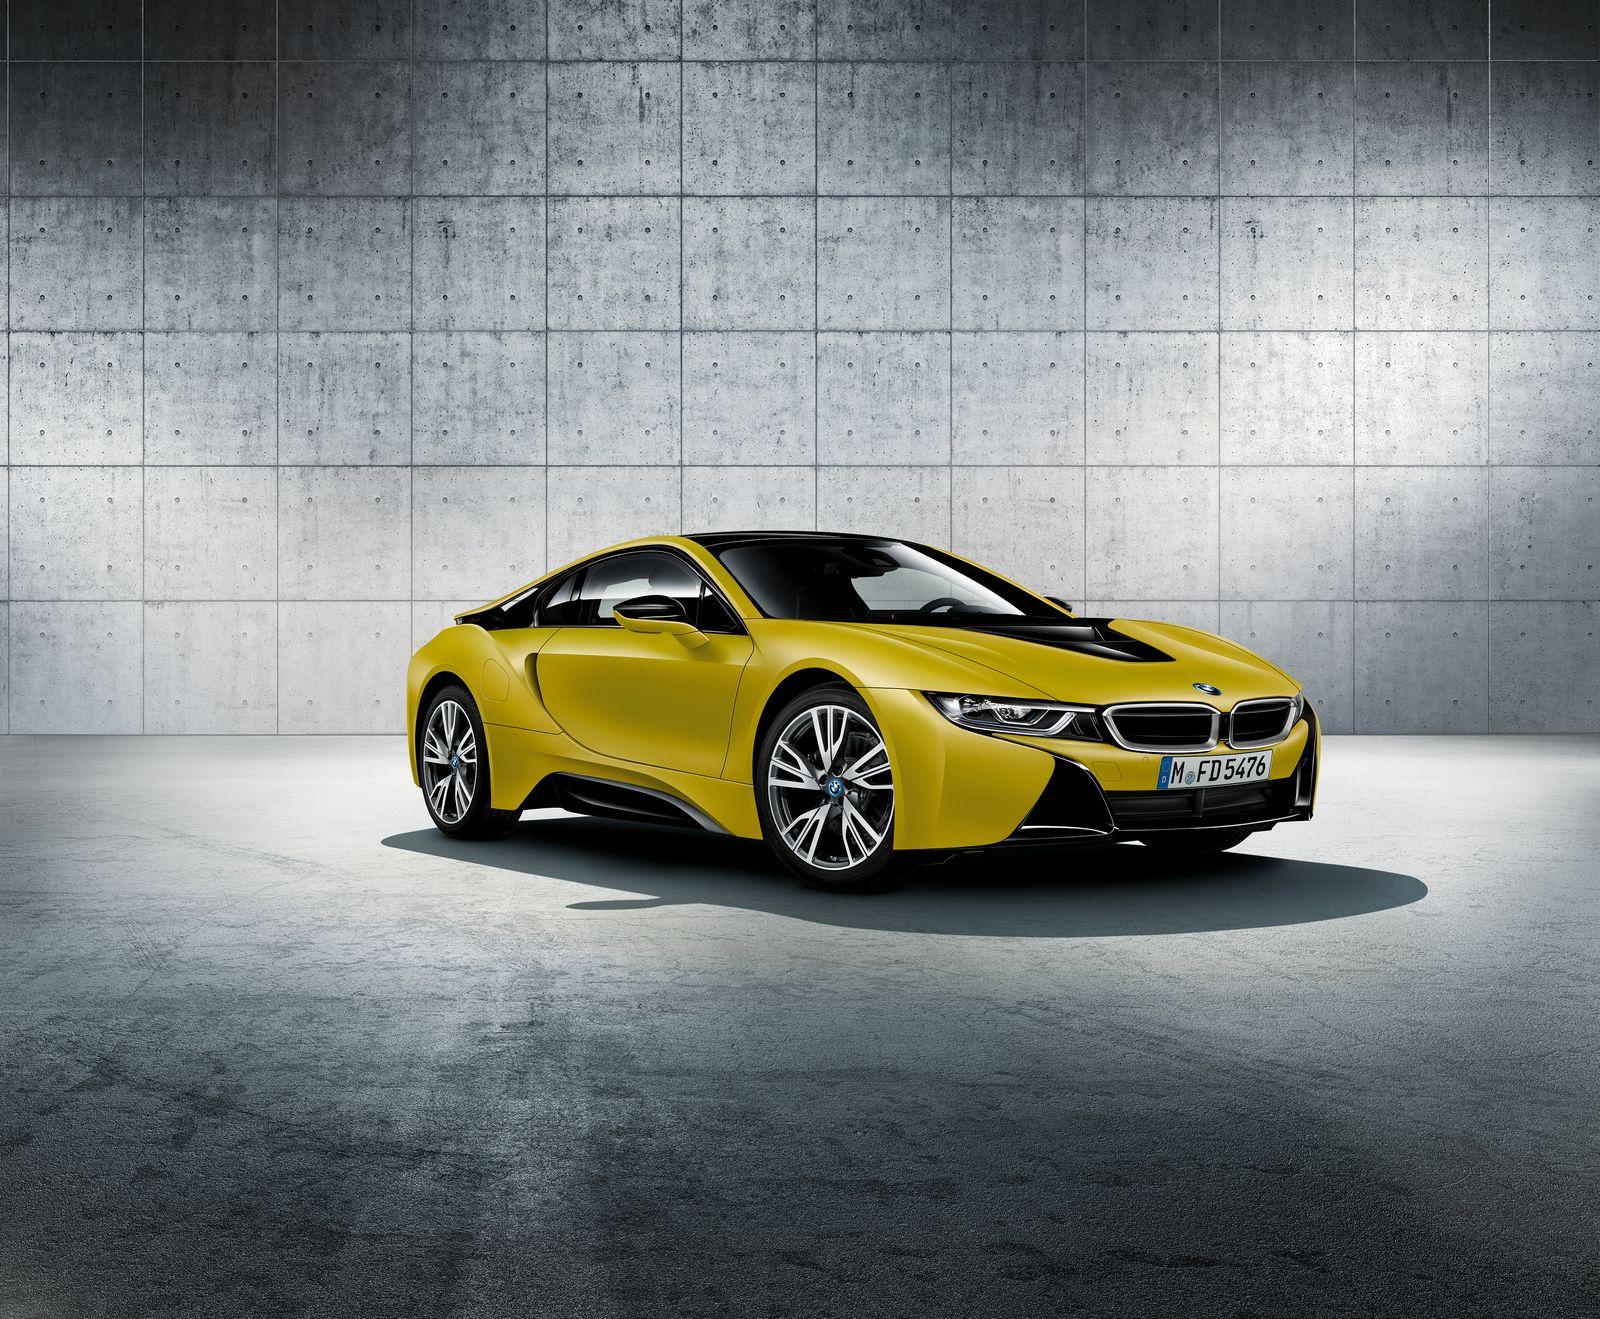 2013 - [BMW] i8 [i12] - Page 22 BMW%2Bi8%2BFrozen%2BYellow%2B1